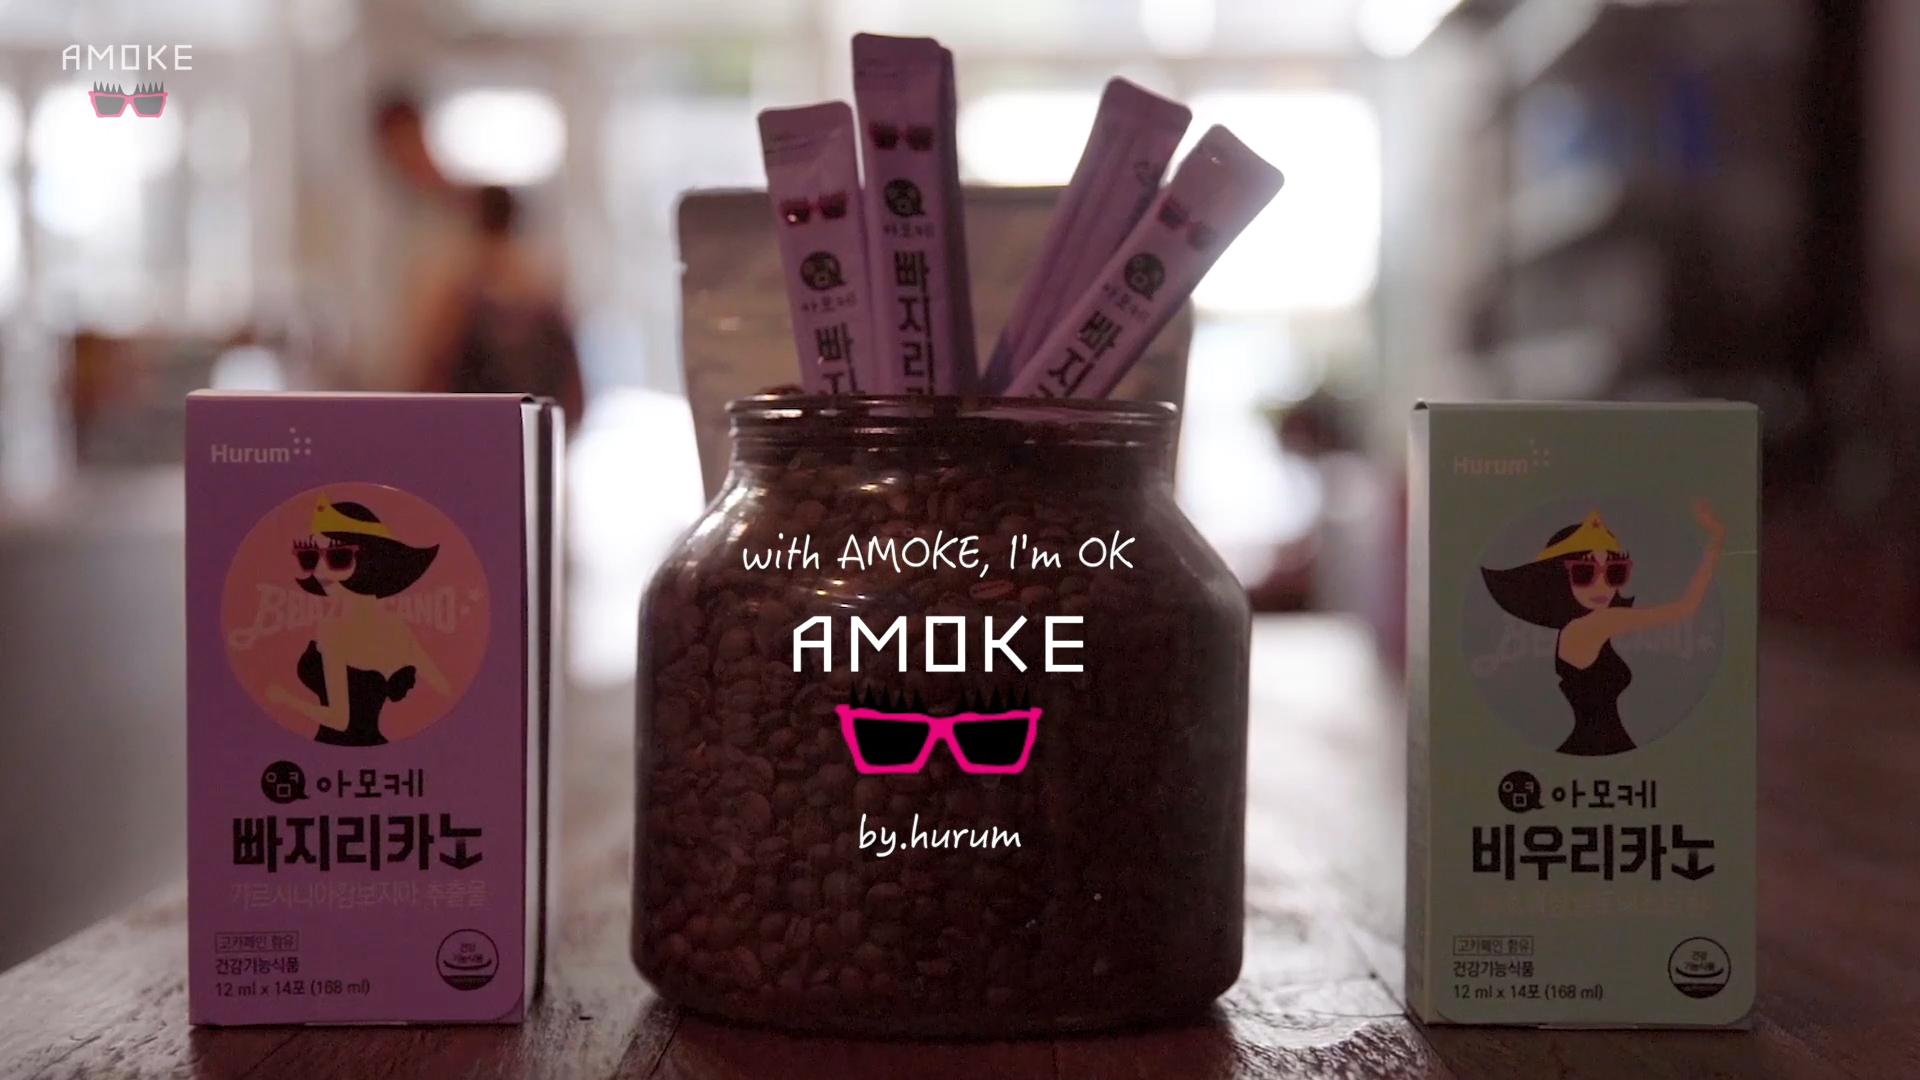 AMOKE Instant Coffee (Ad) - 2018